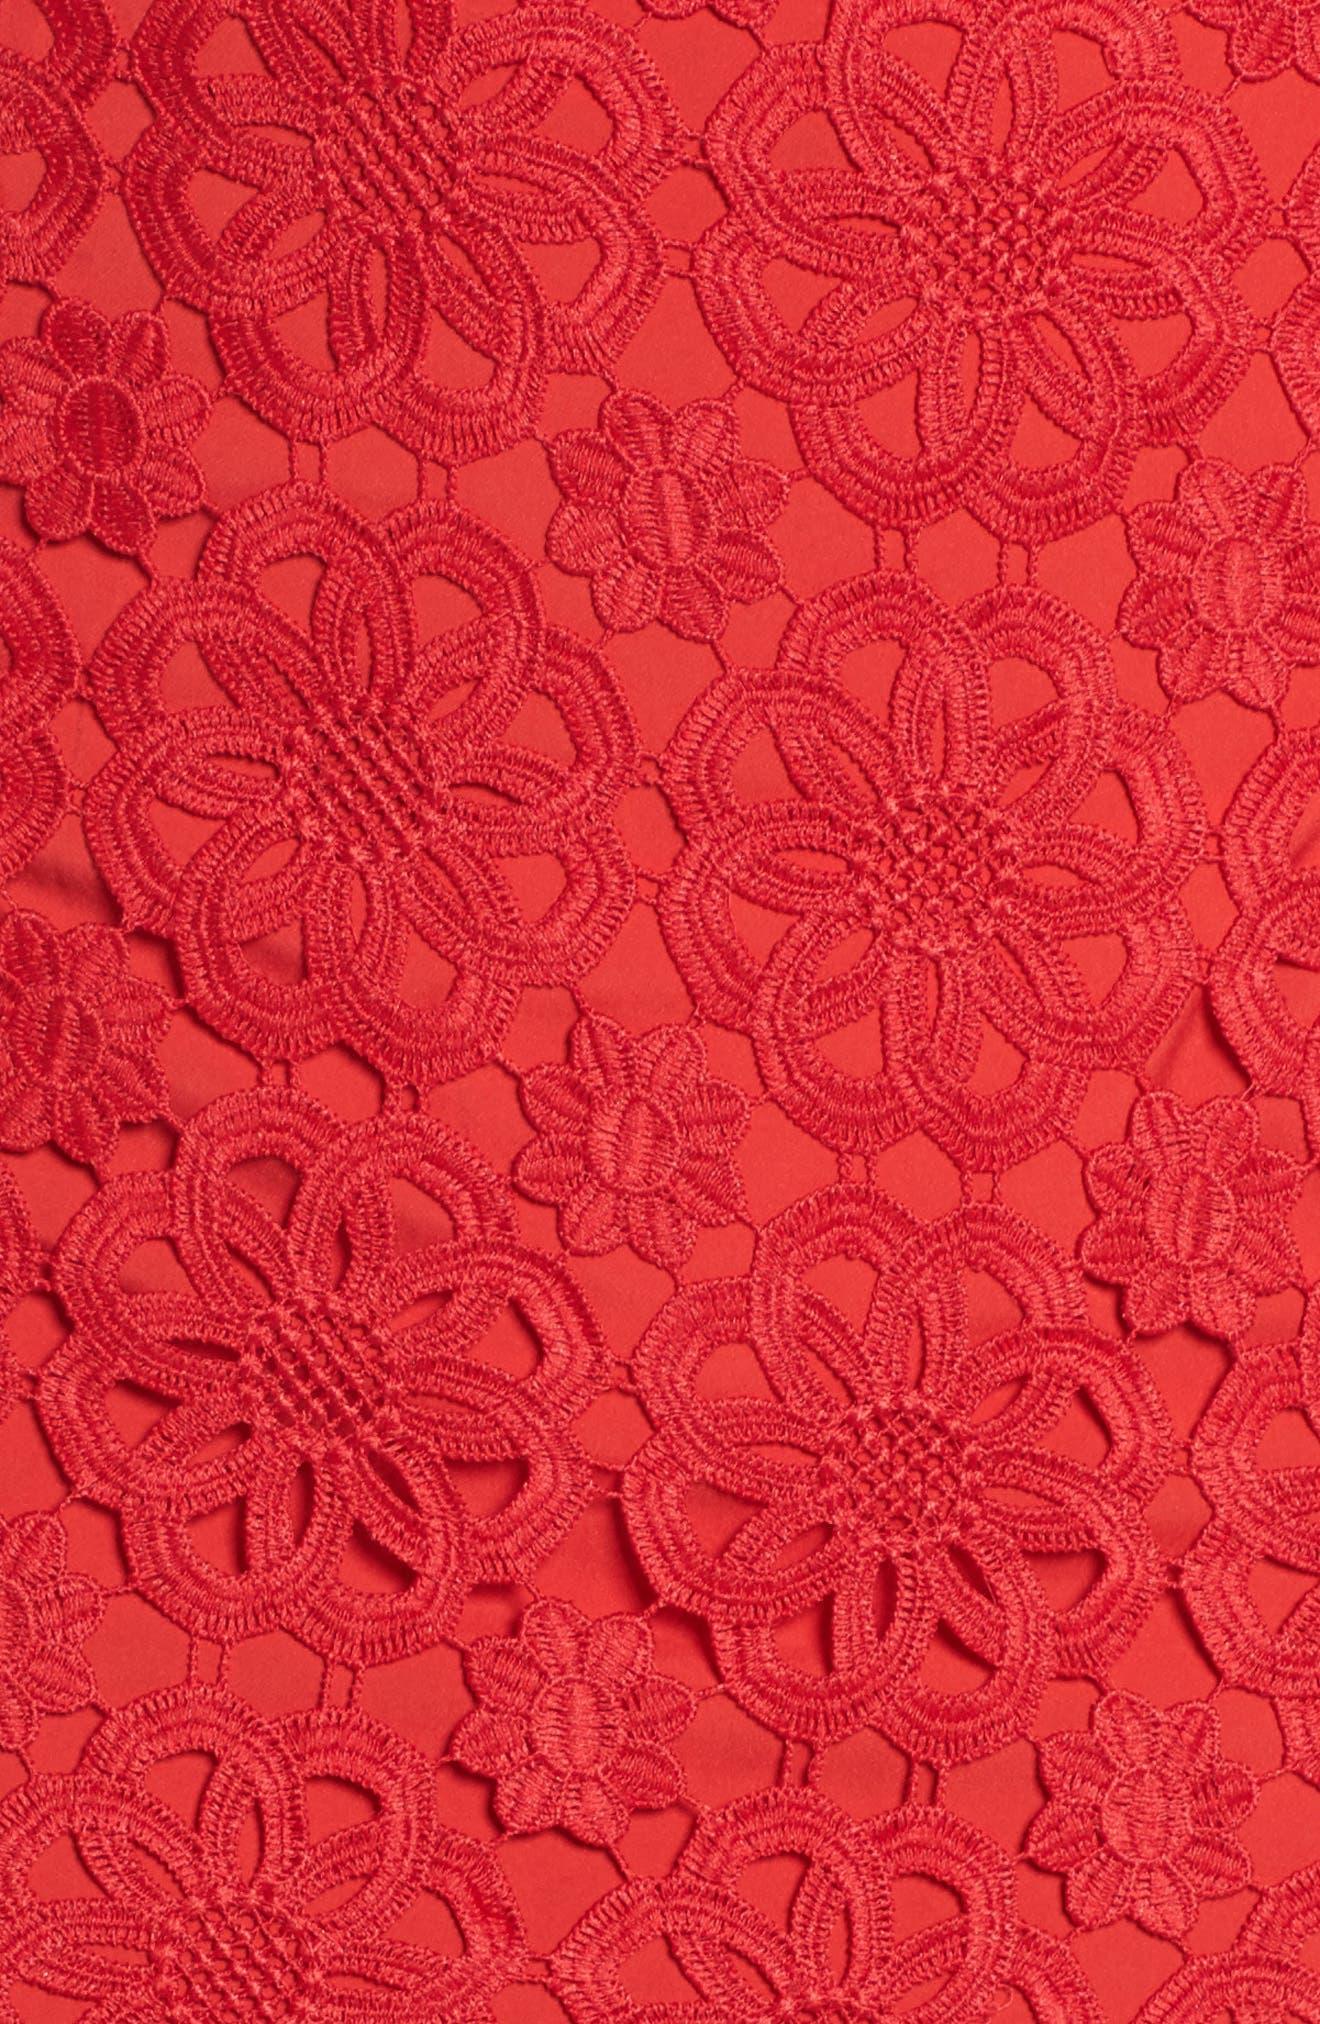 Ruffle Hem Lace Sheath Dress,                             Alternate thumbnail 5, color,                             610